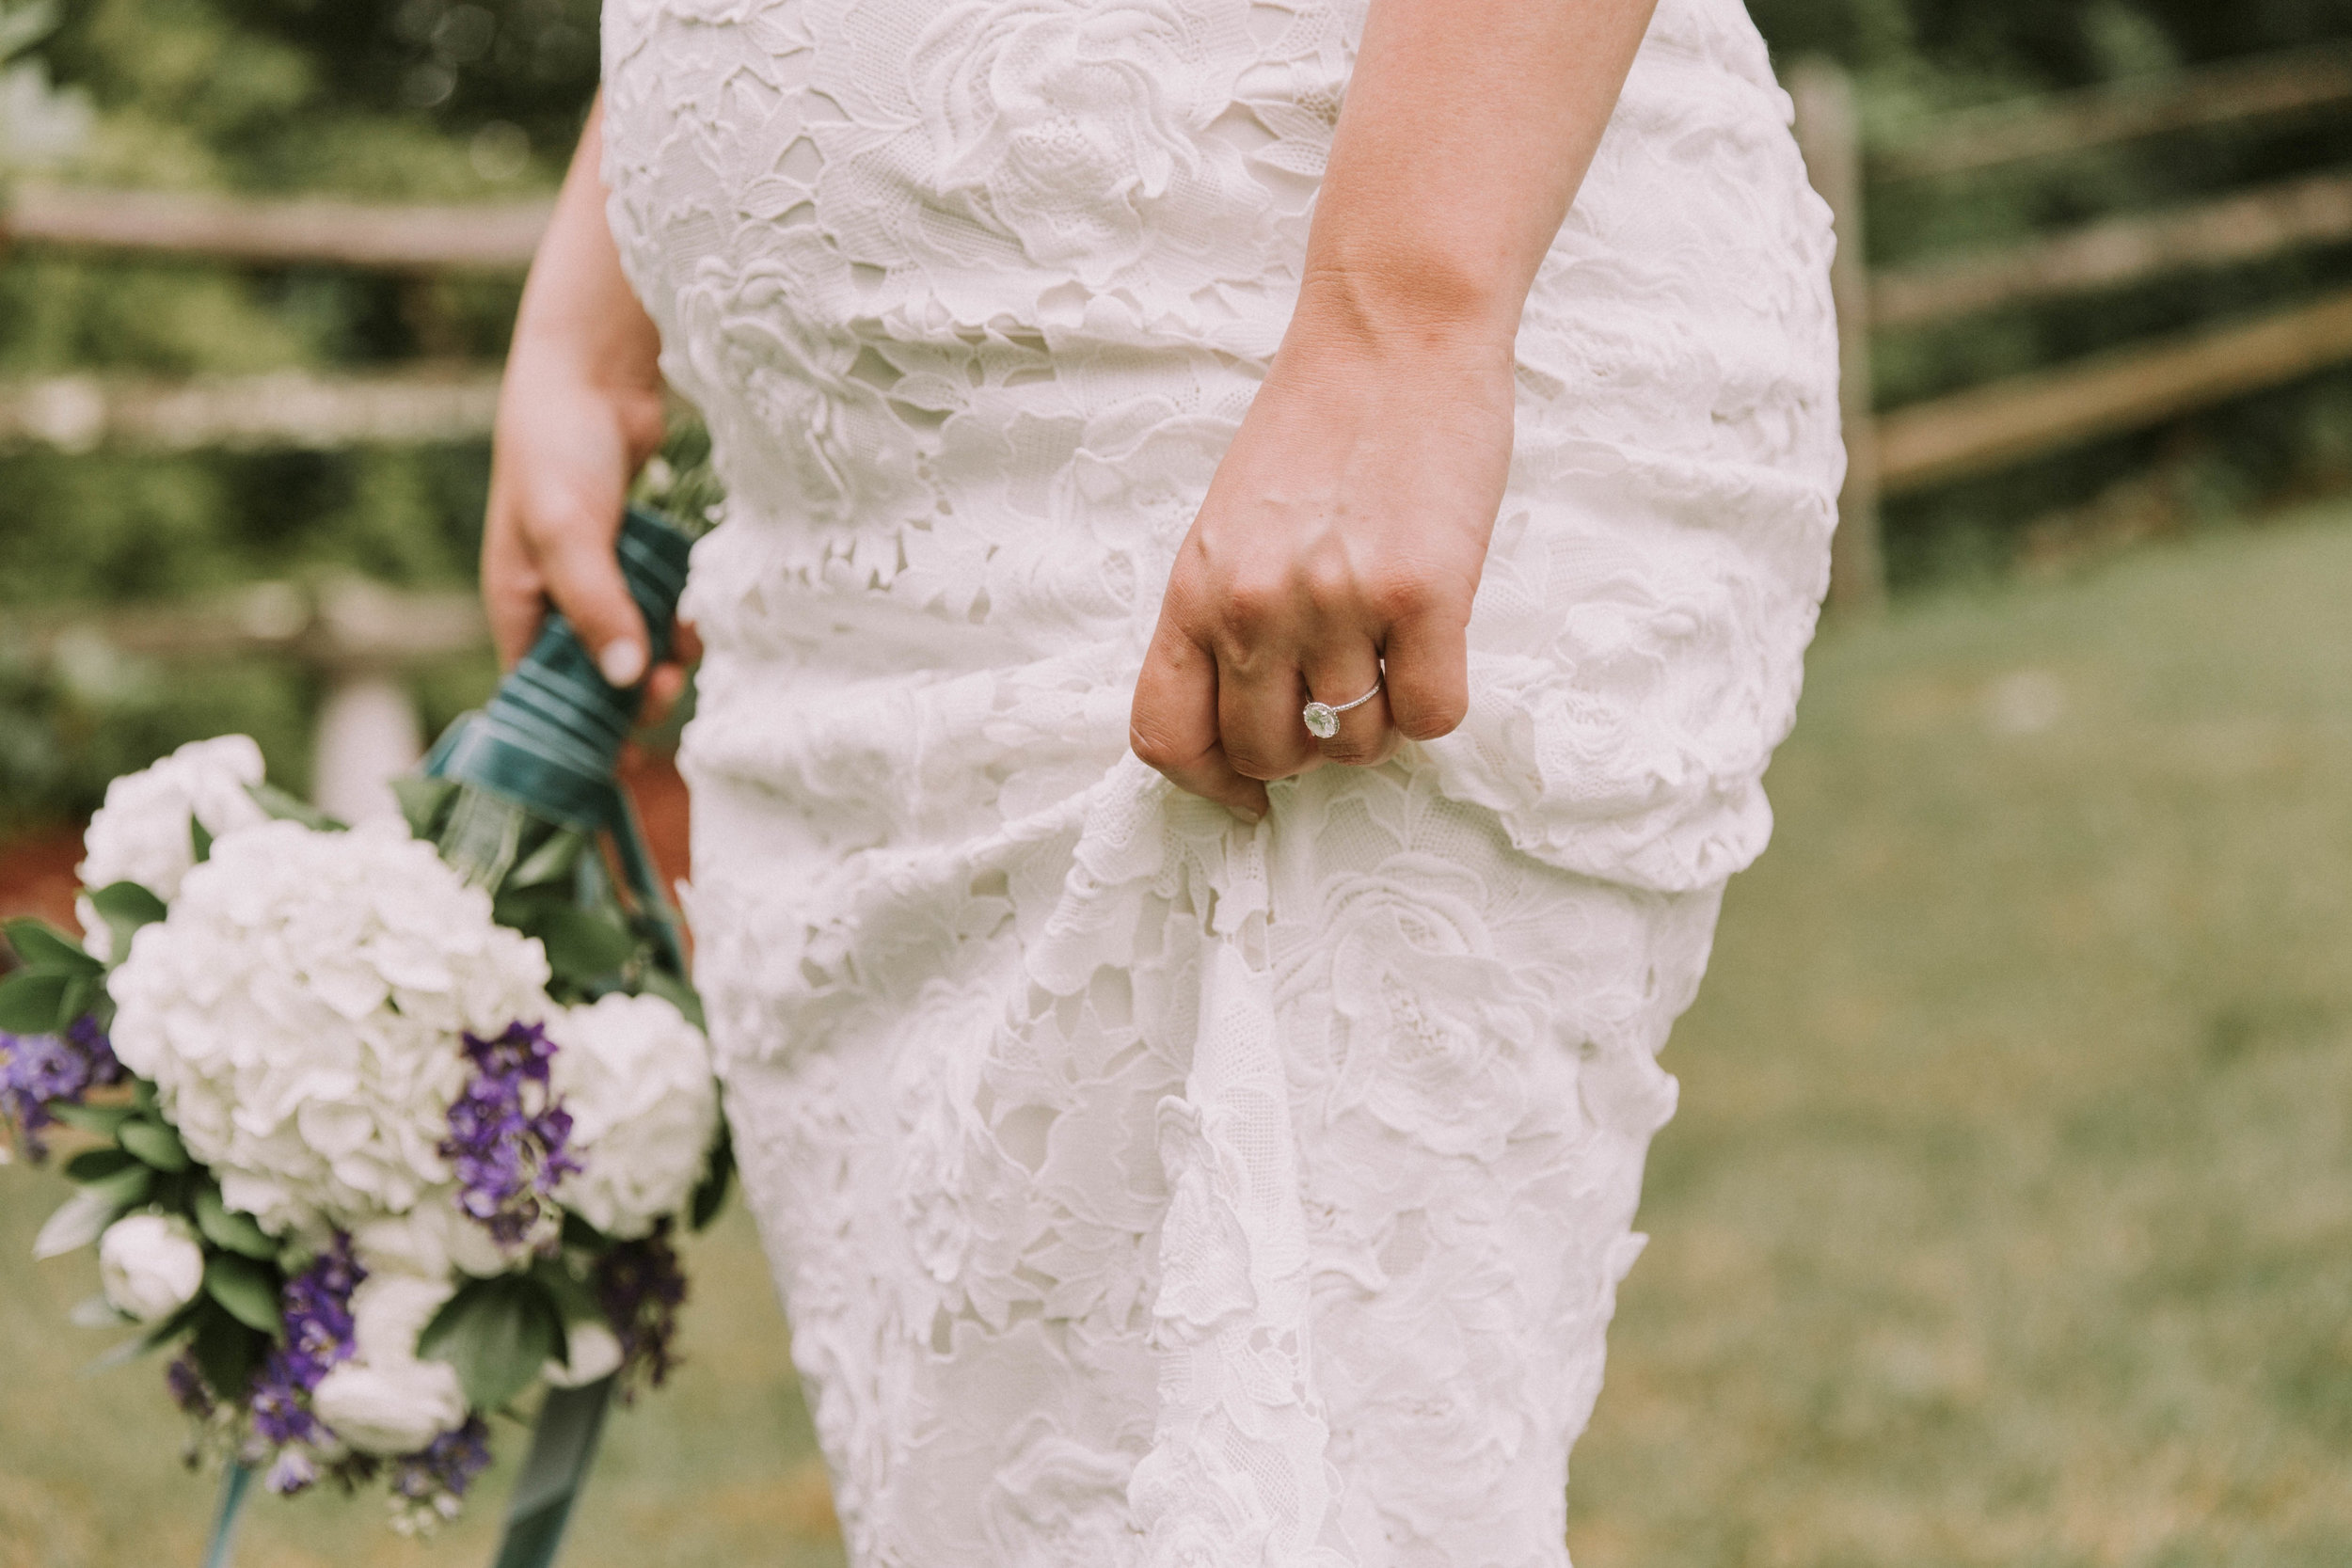 spitale-elopement-blog-16-of-18.jpg